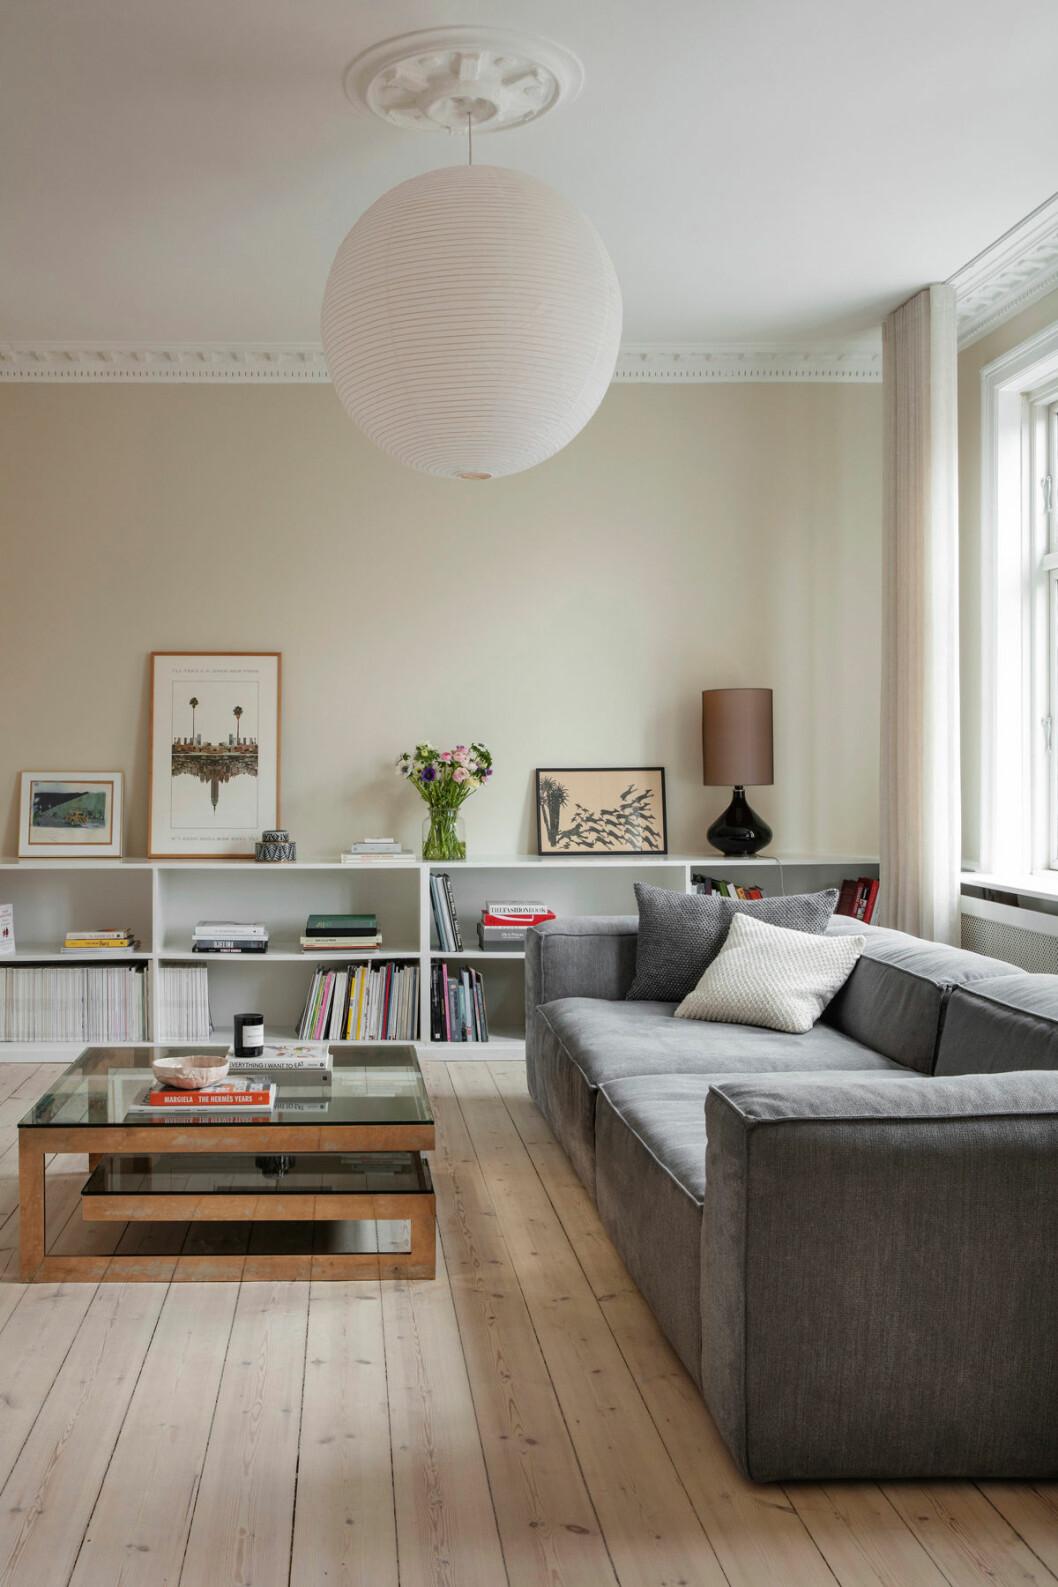 Hemma hos Josephine soffa hylla vardagsrum Elle decoration